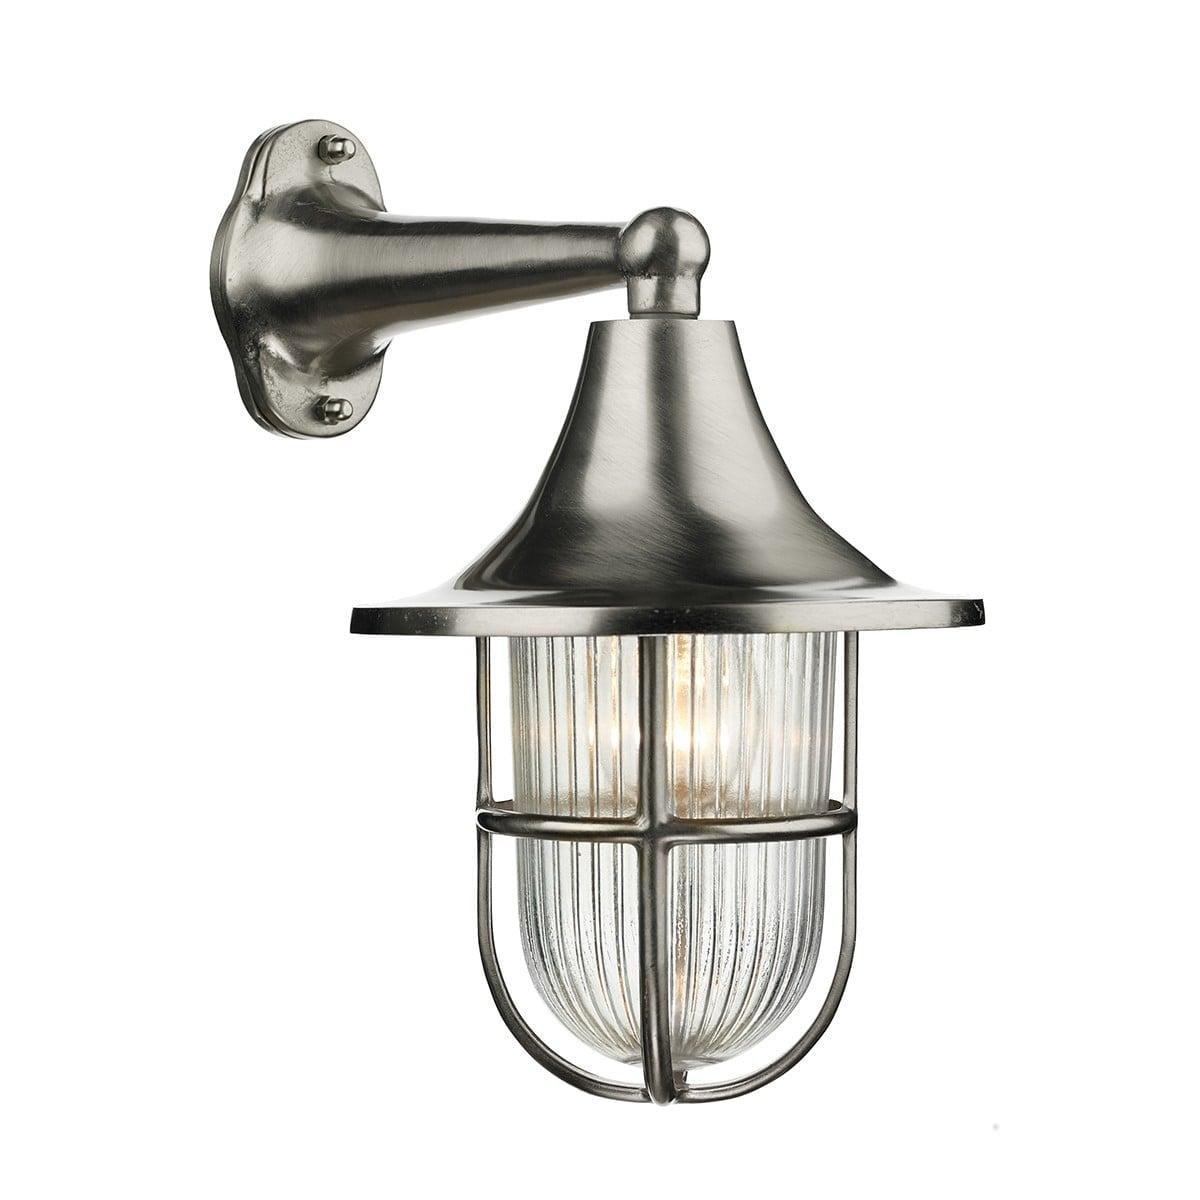 David Hunt Lighting WAD1538 Wadebridge 1 light wall light, Nickel